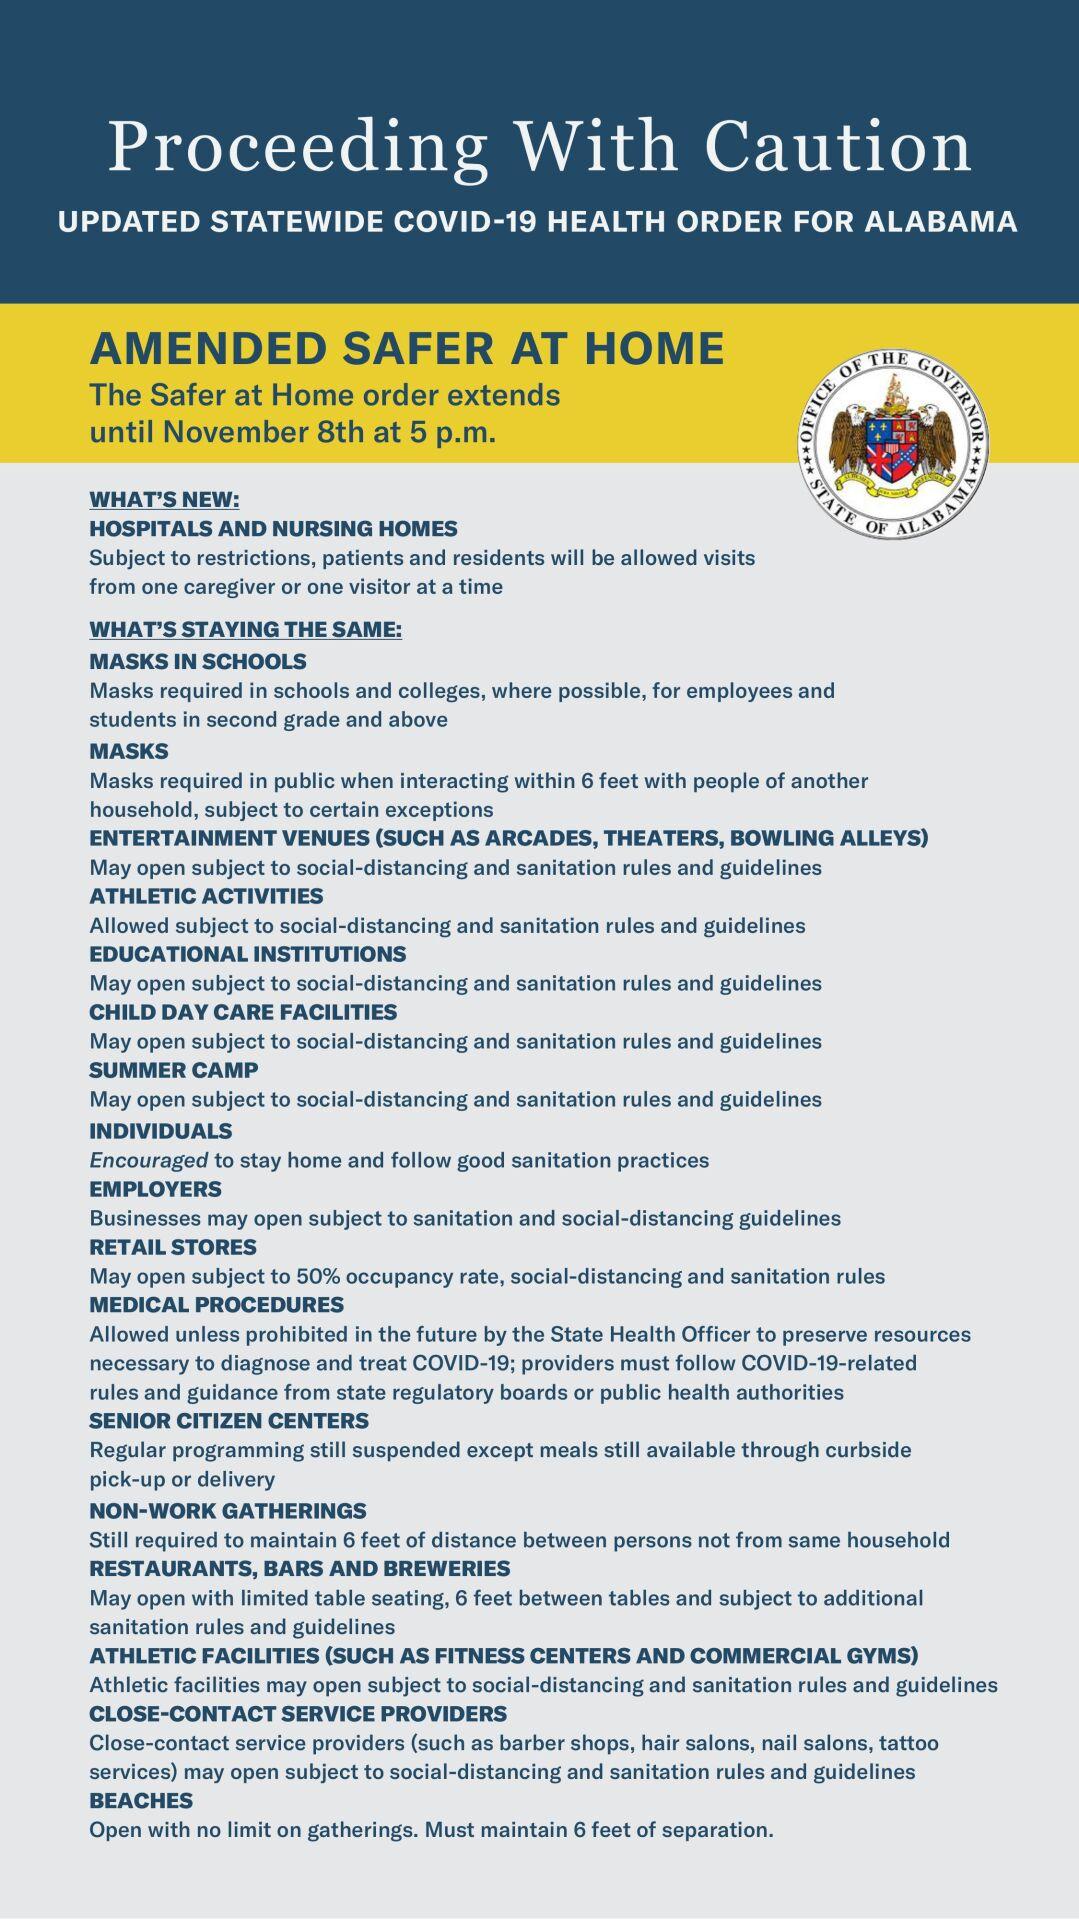 GKI-0040-2020-Health-Order-Update-Nov-8-Vertical-2.pdf